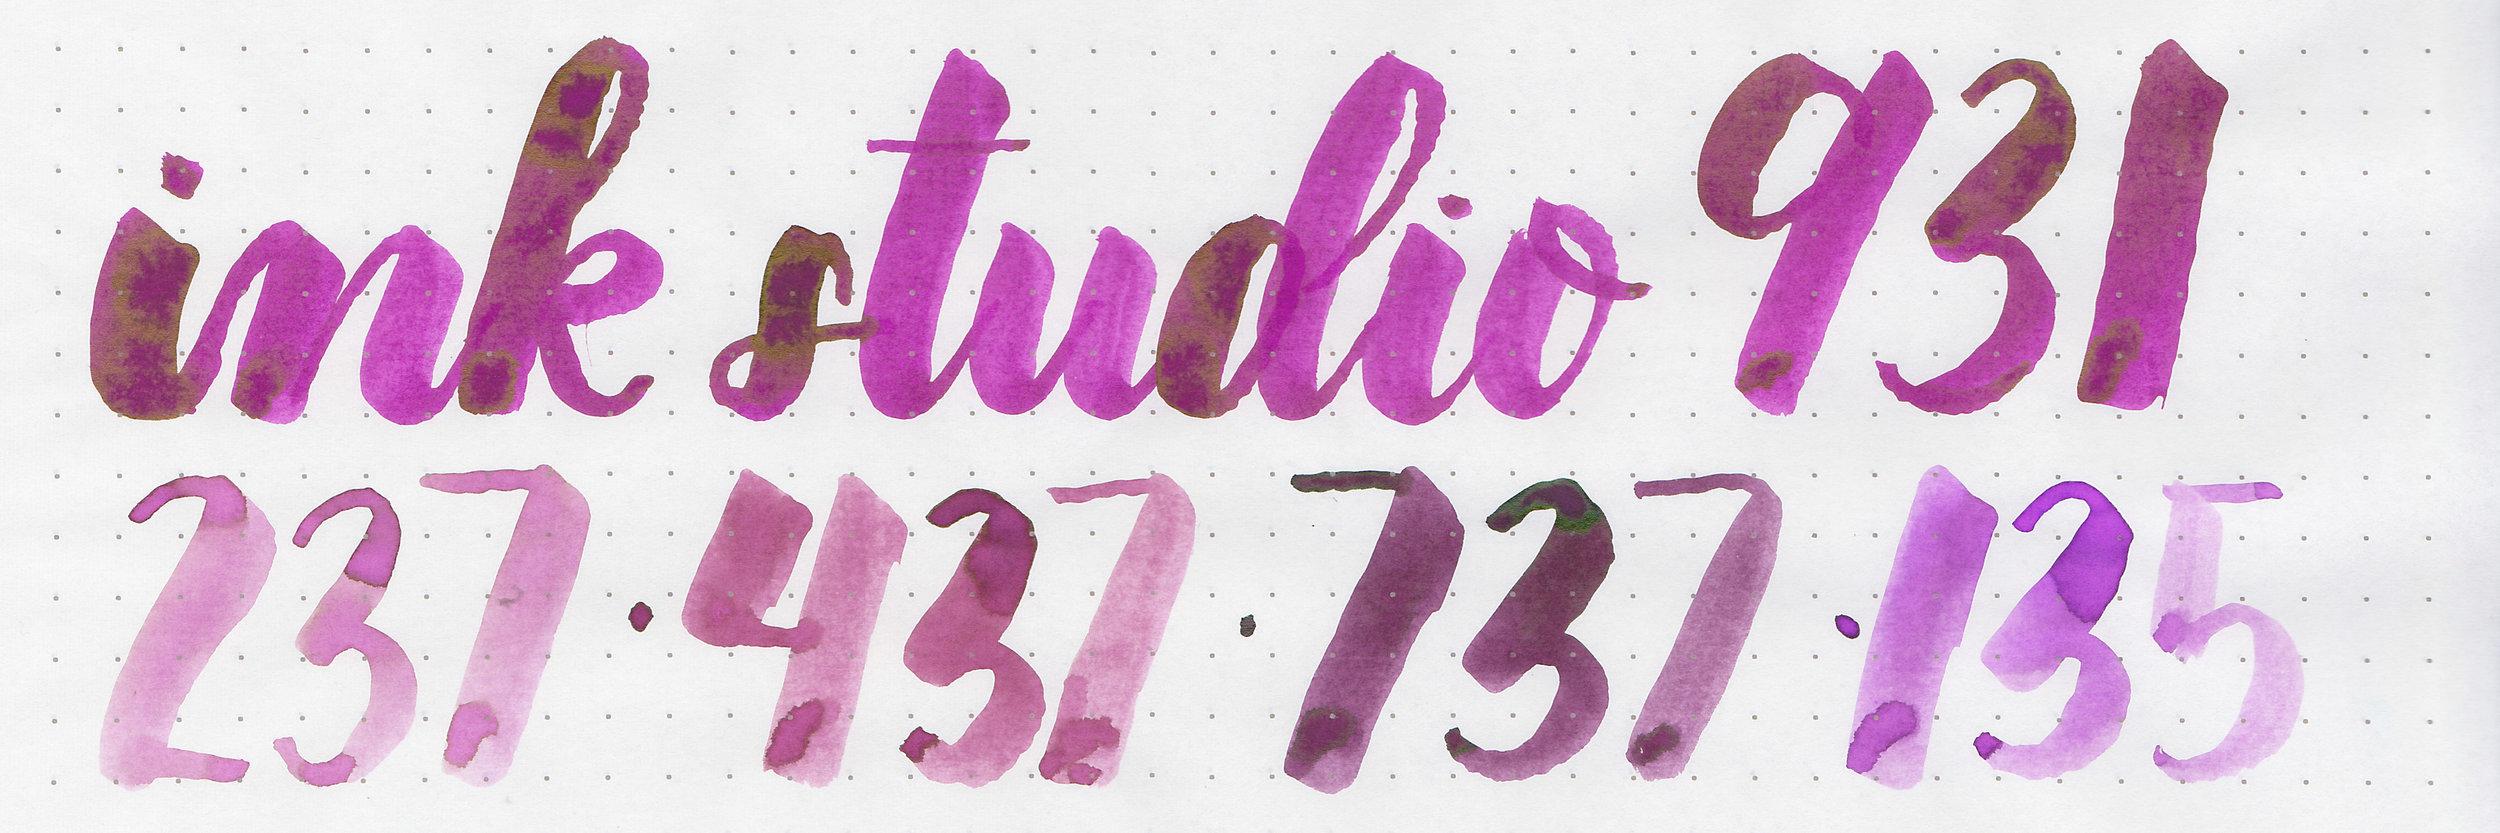 sis-set4-7.jpg